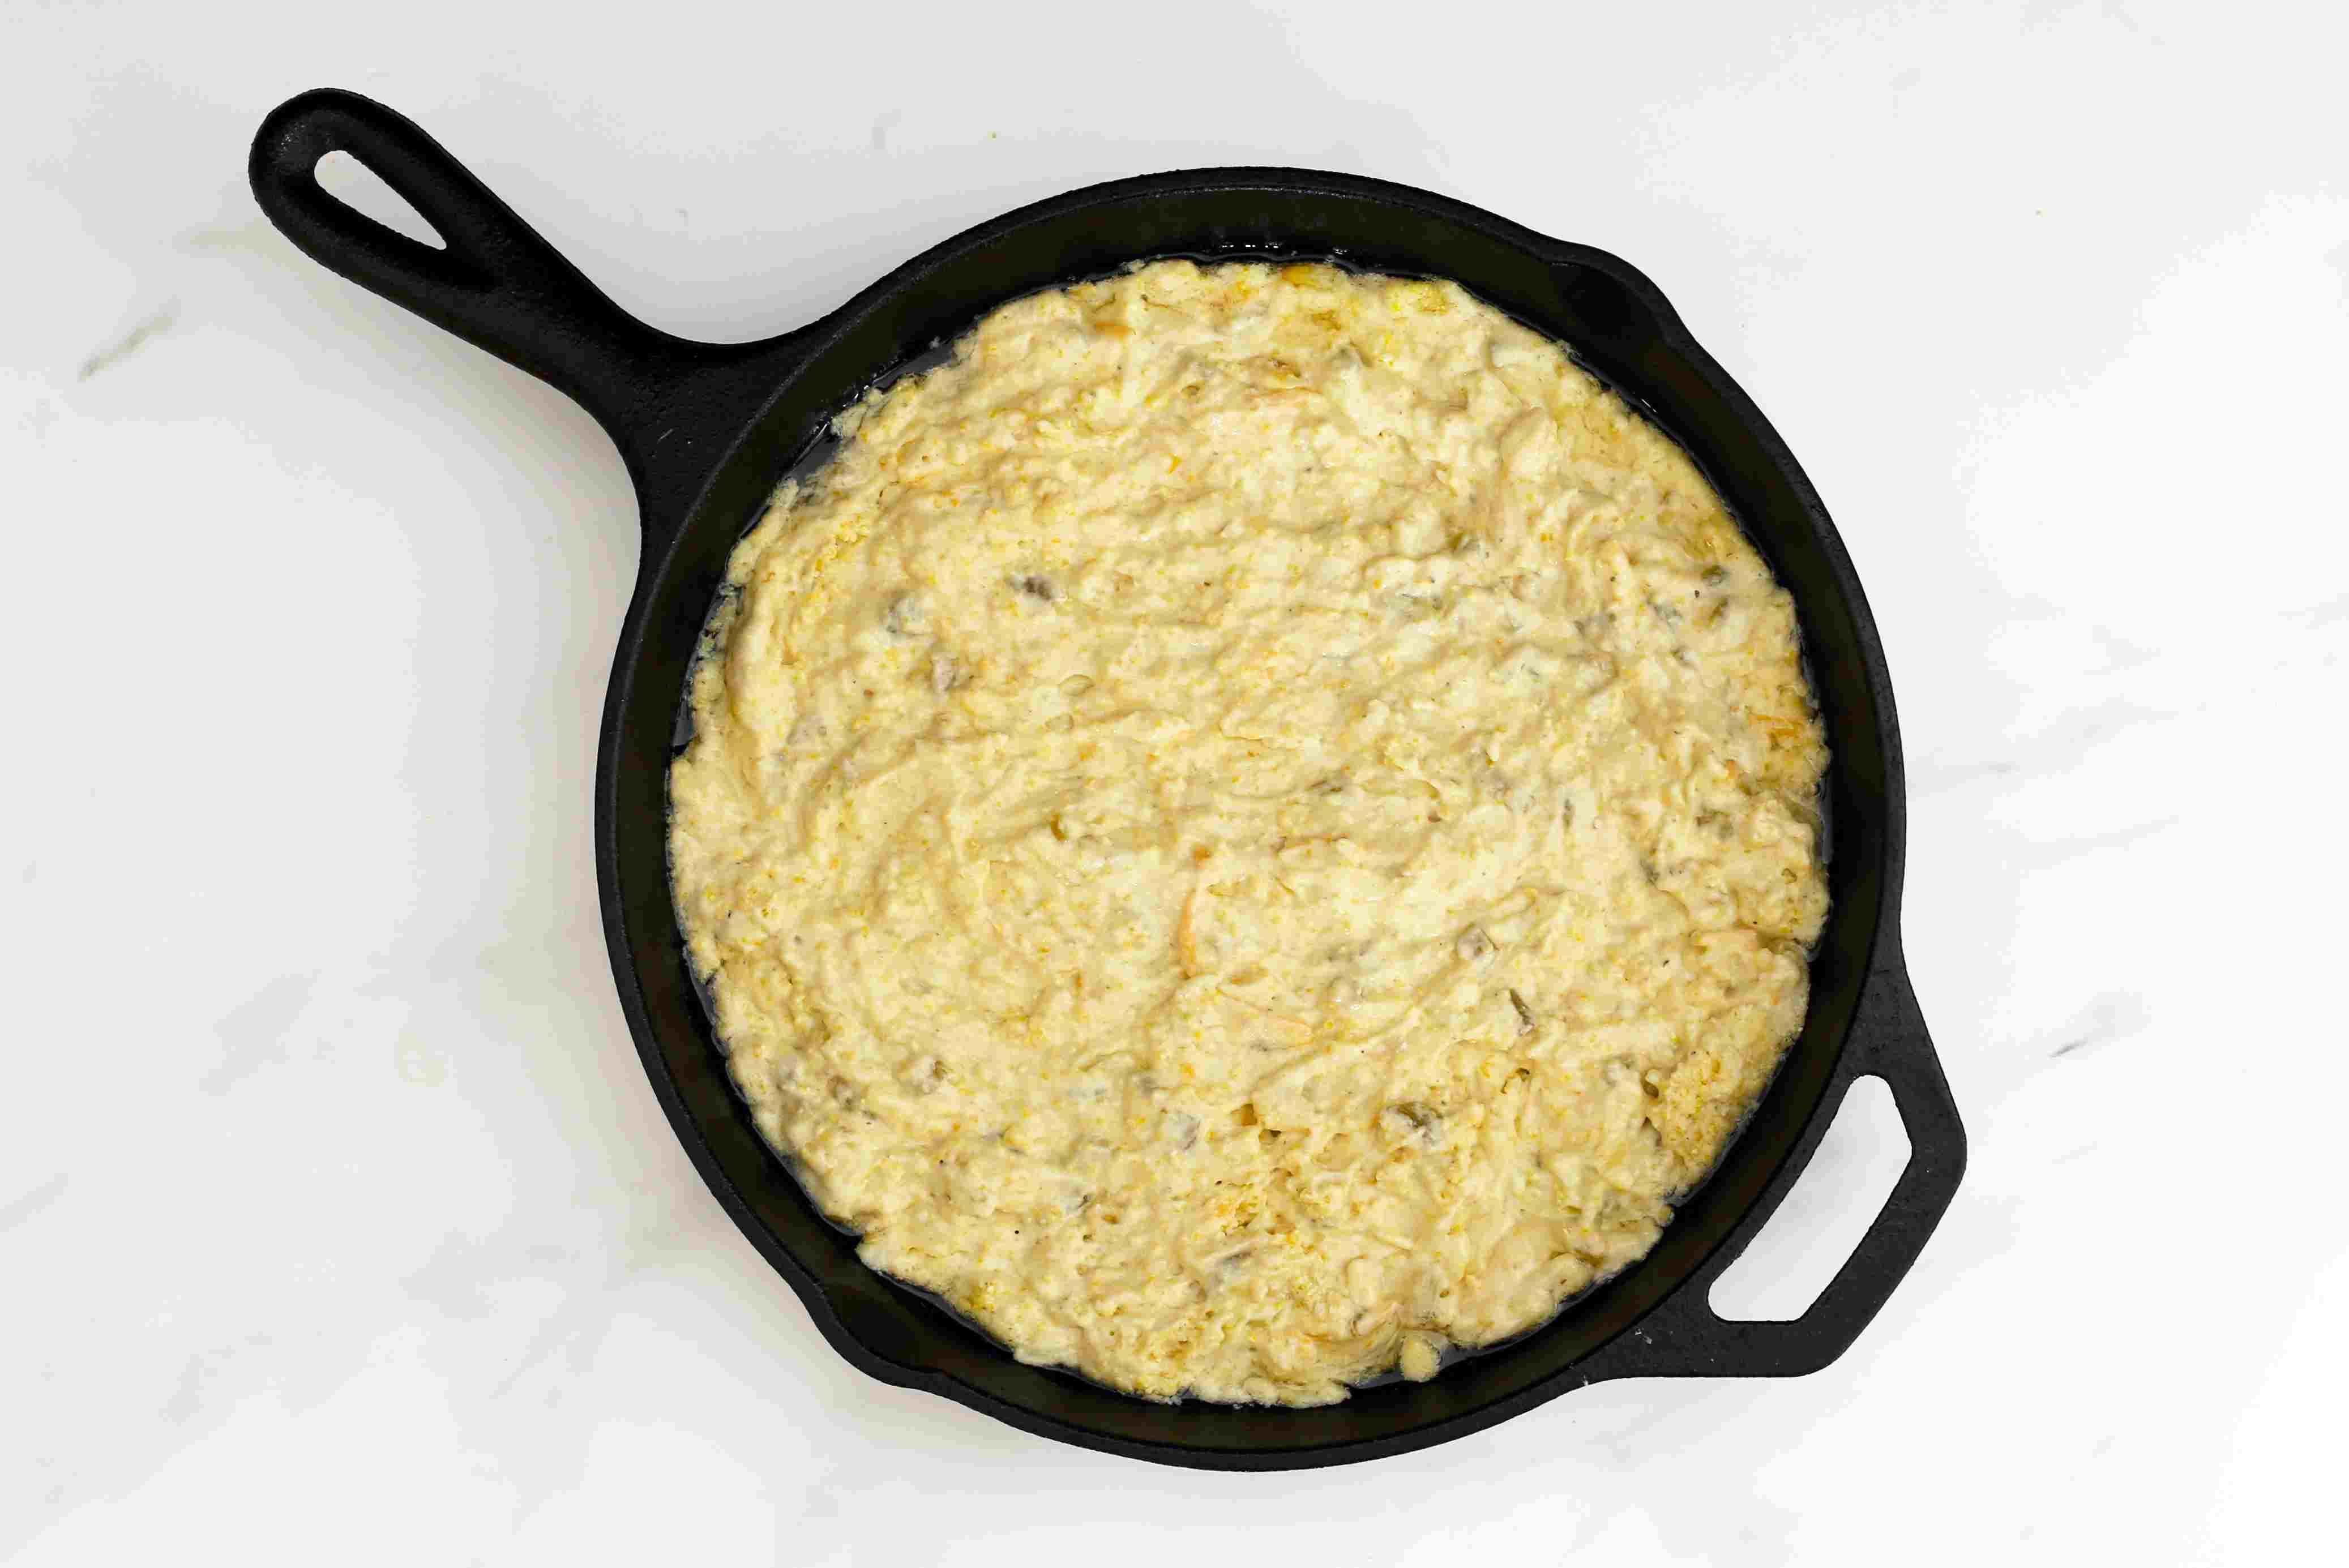 Mexican cornbread ready to go into the oven.